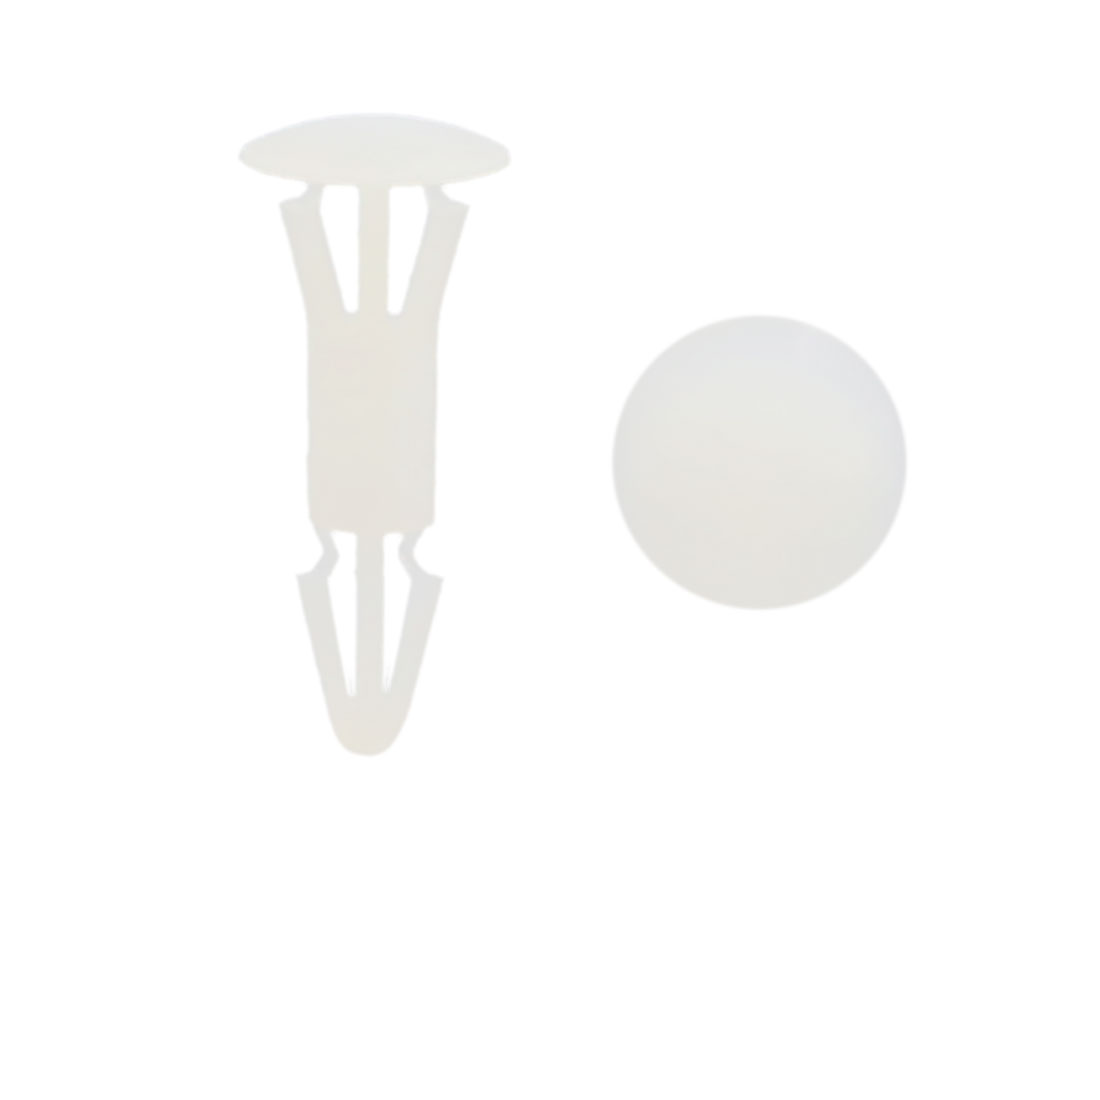 1000pcs Universal White Plastic Fasteners Clips Rivet for Car Auto Bumper Fender